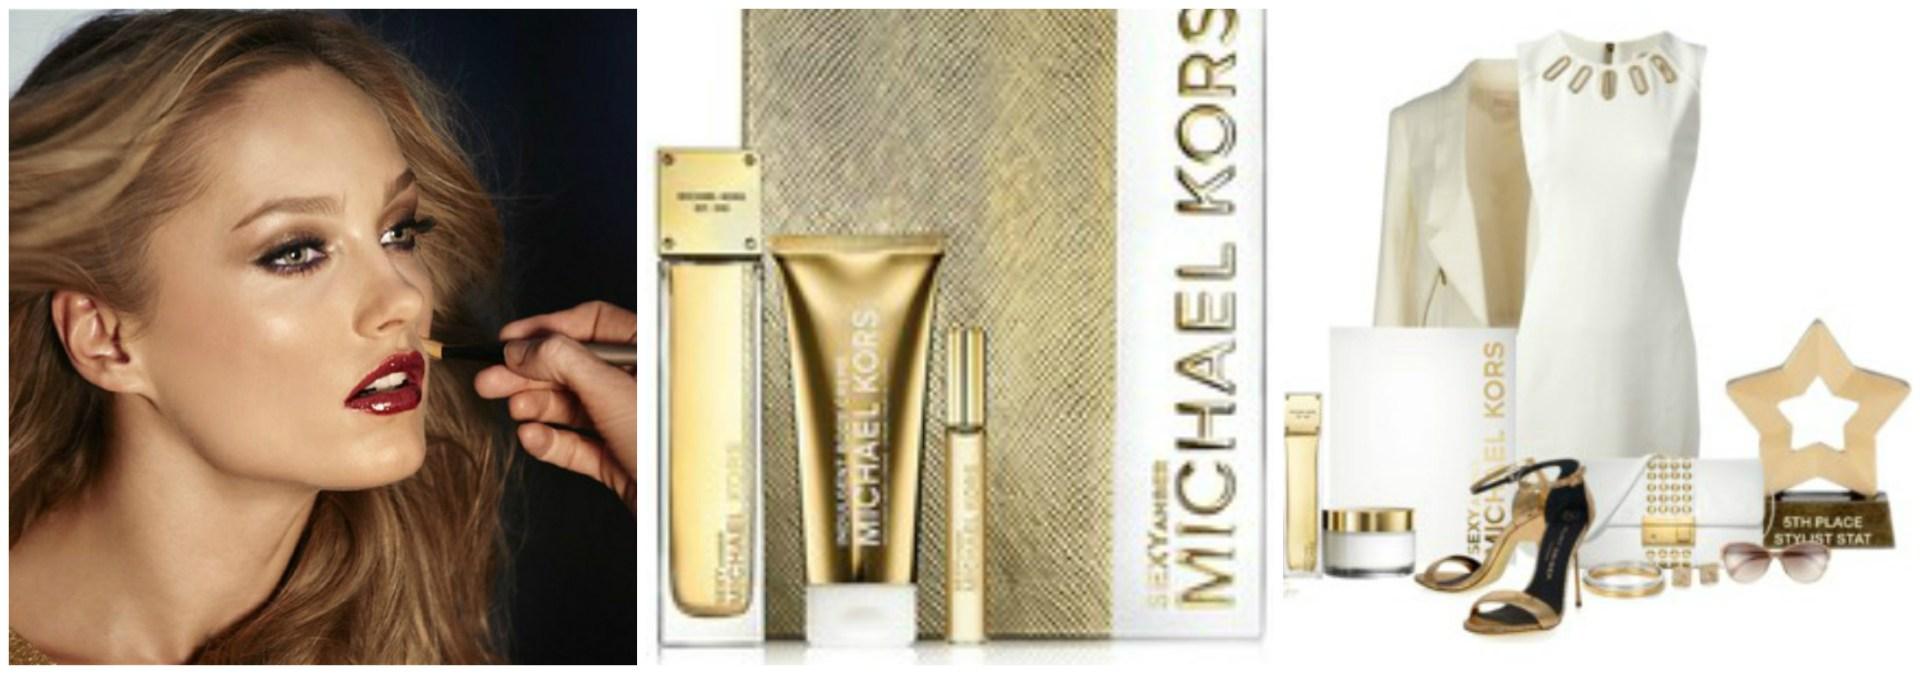 Sexy Amber Michael Kors Perfume